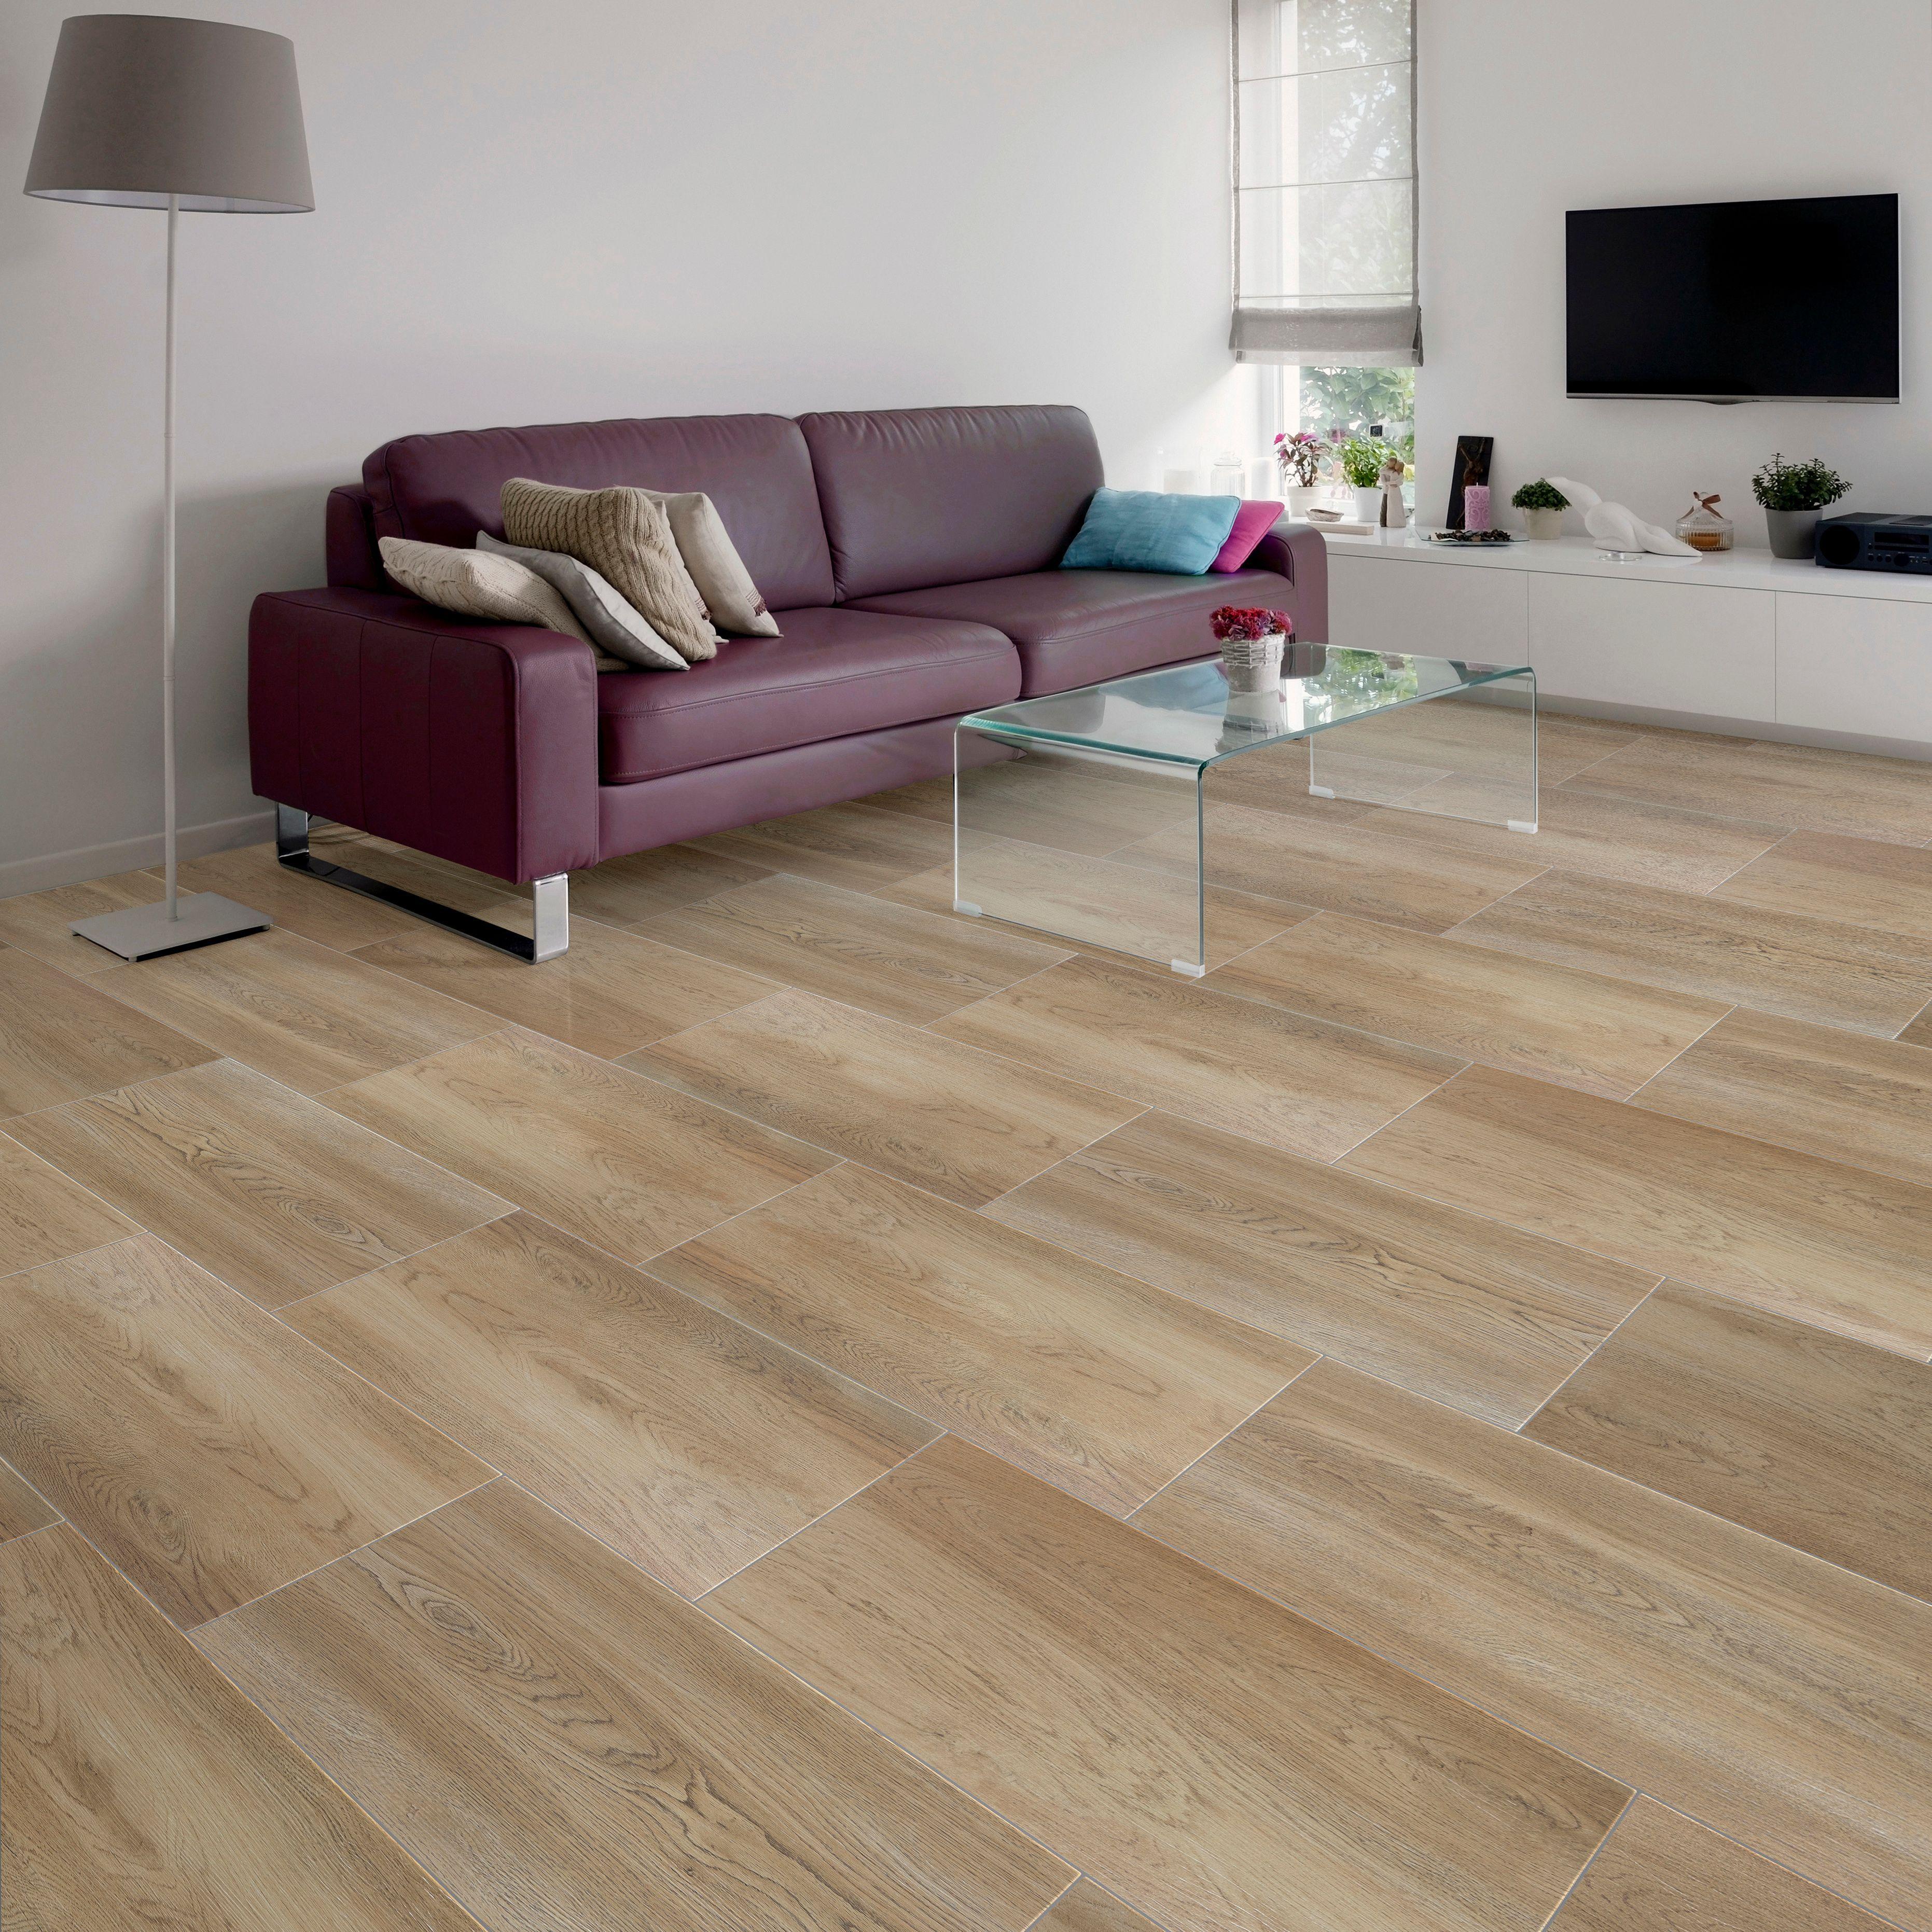 tile porcelain norway floors products imports floor eco glazed